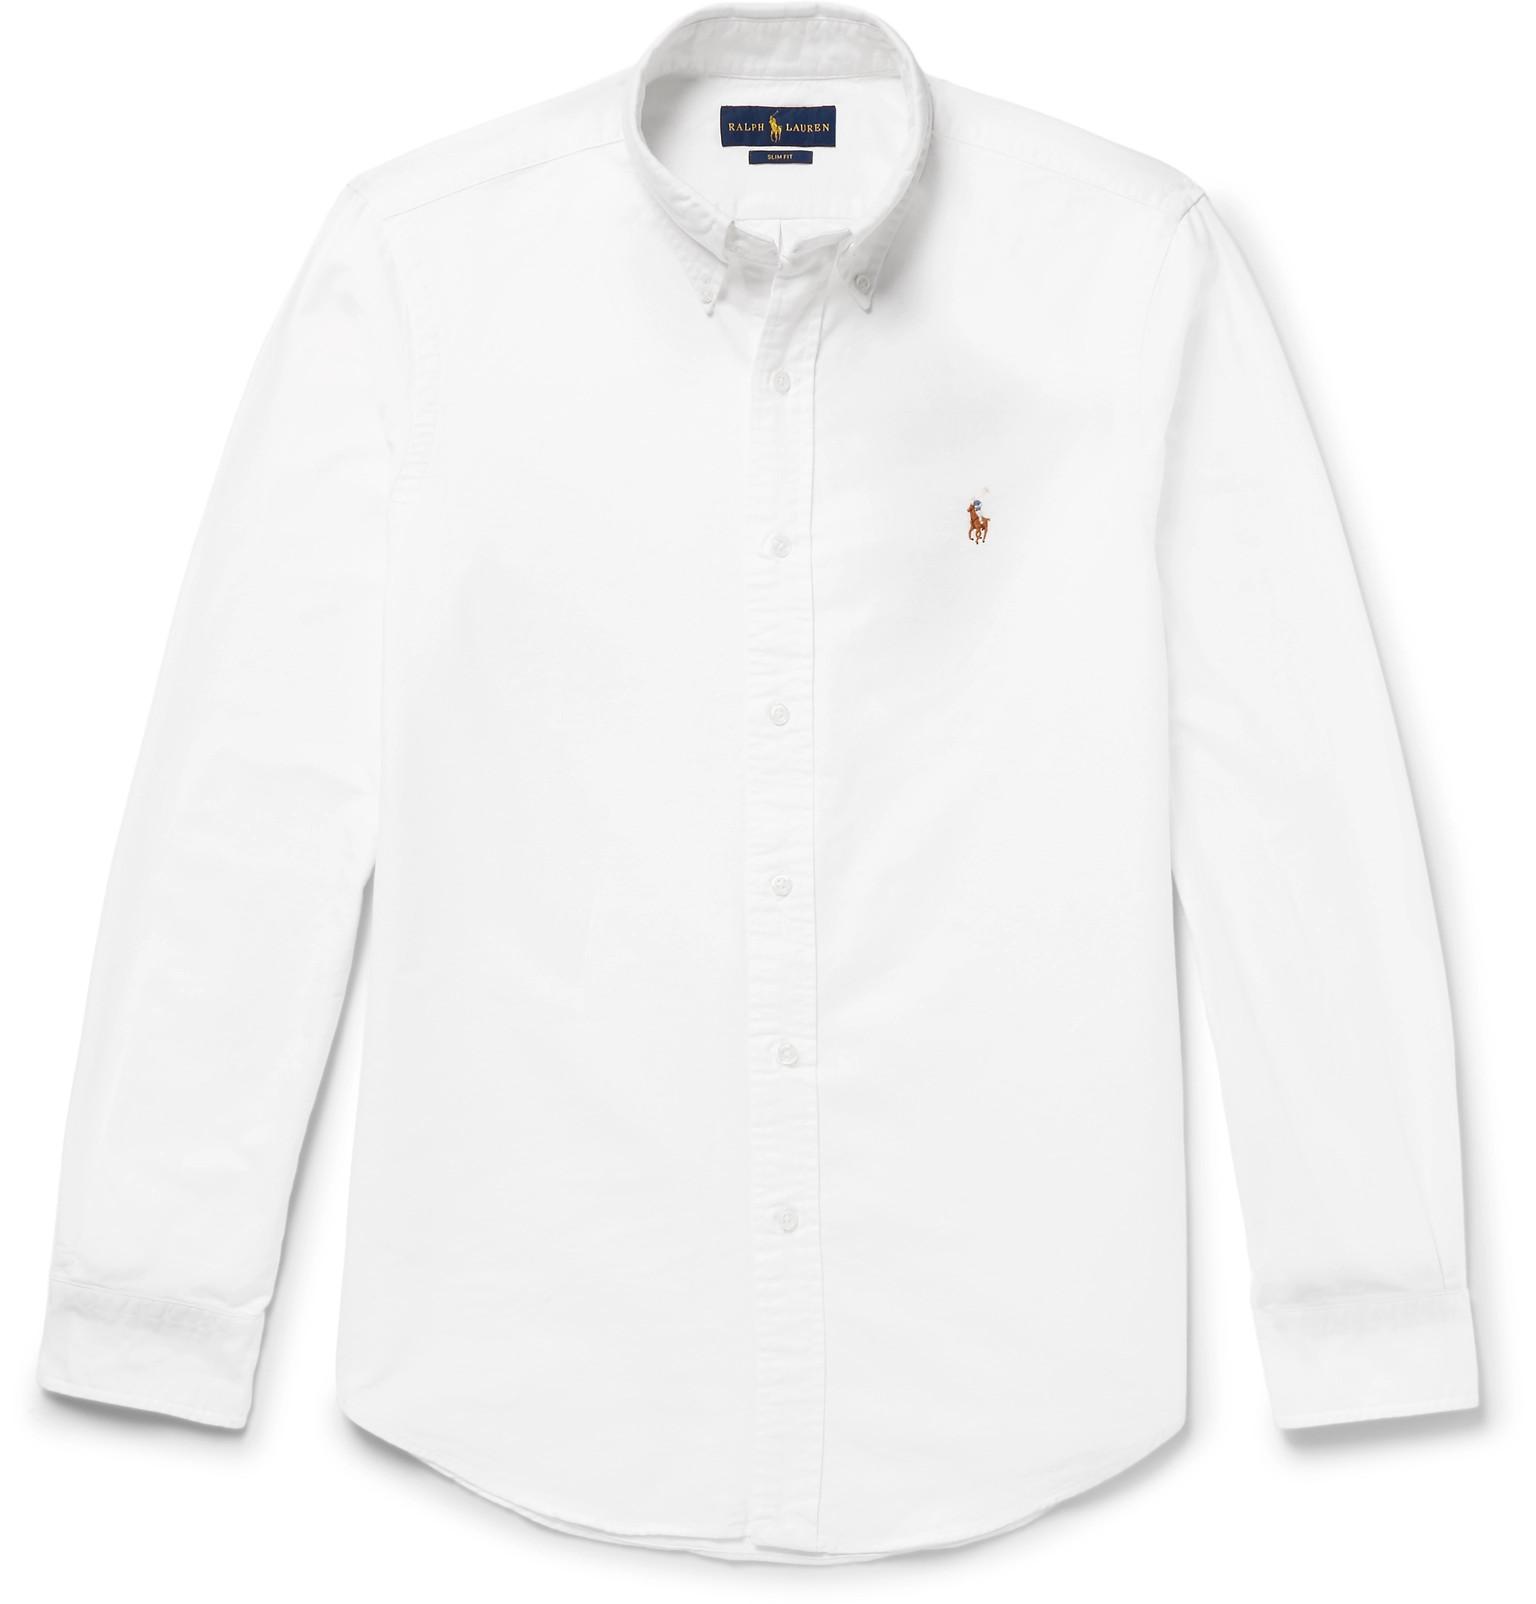 1bbbe0577dab Polo Ralph Lauren - Slim-Fit Cotton Oxford Shirt